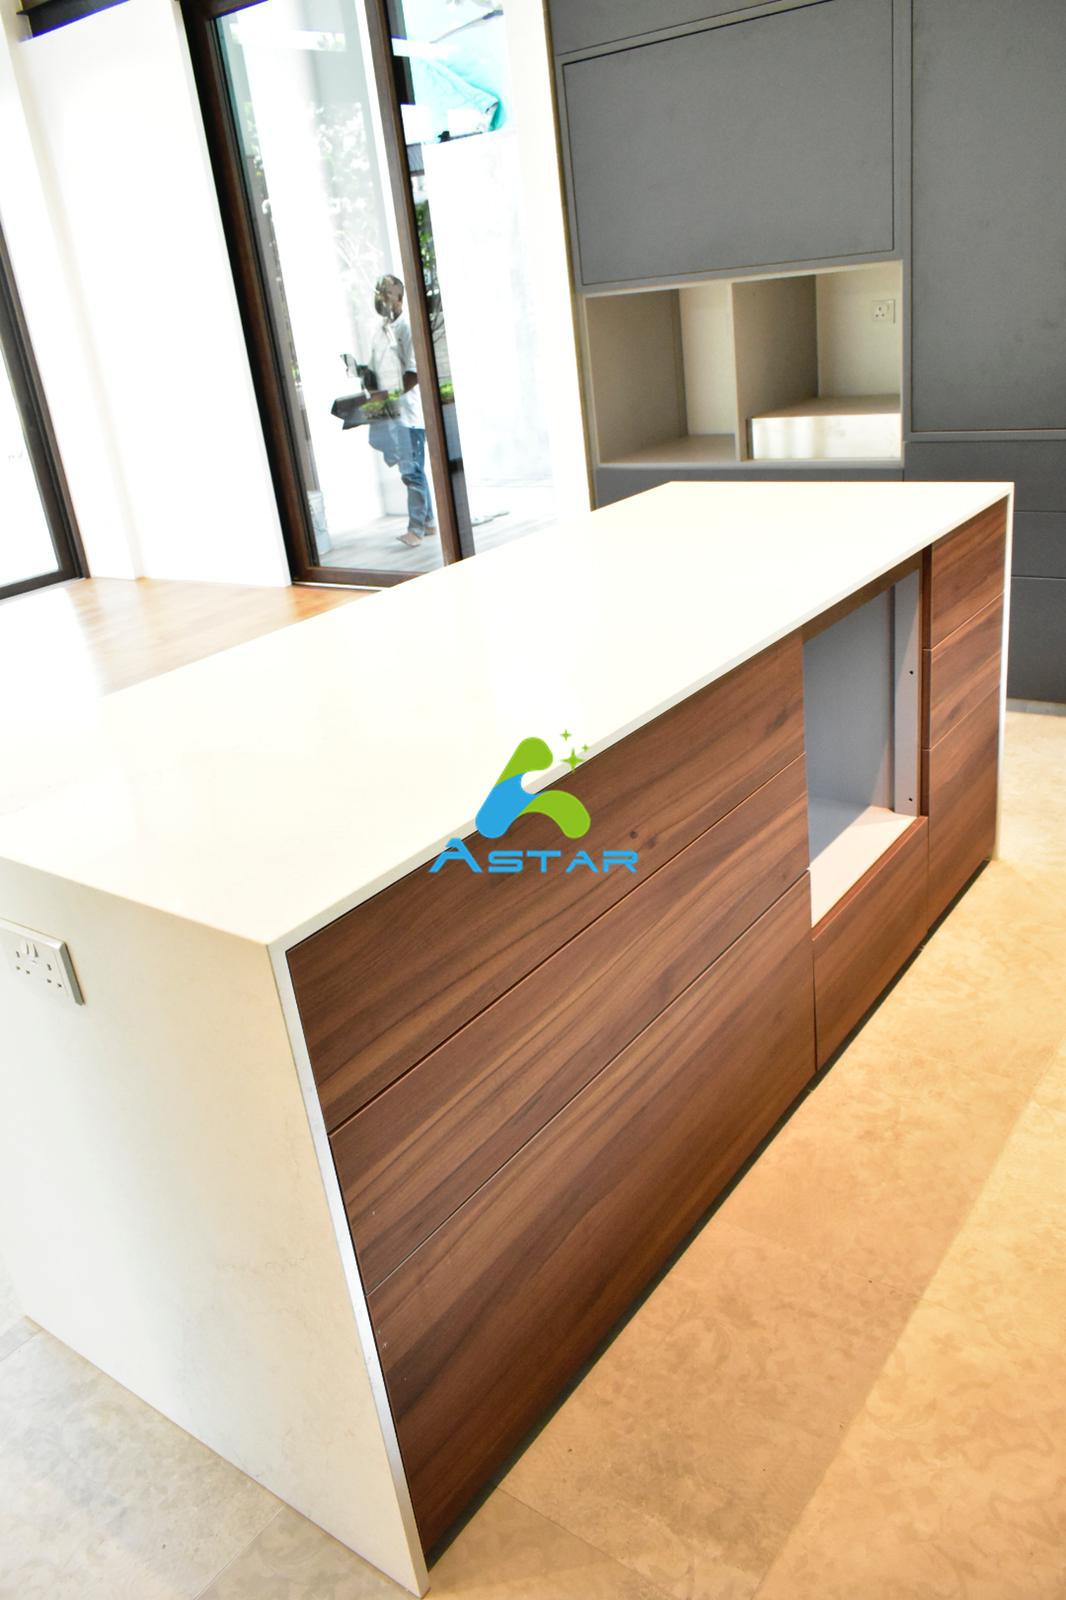 astar furnishing complete projects aluminium kitchen cabinet vanity cabinet wardrobe gardenia road 18